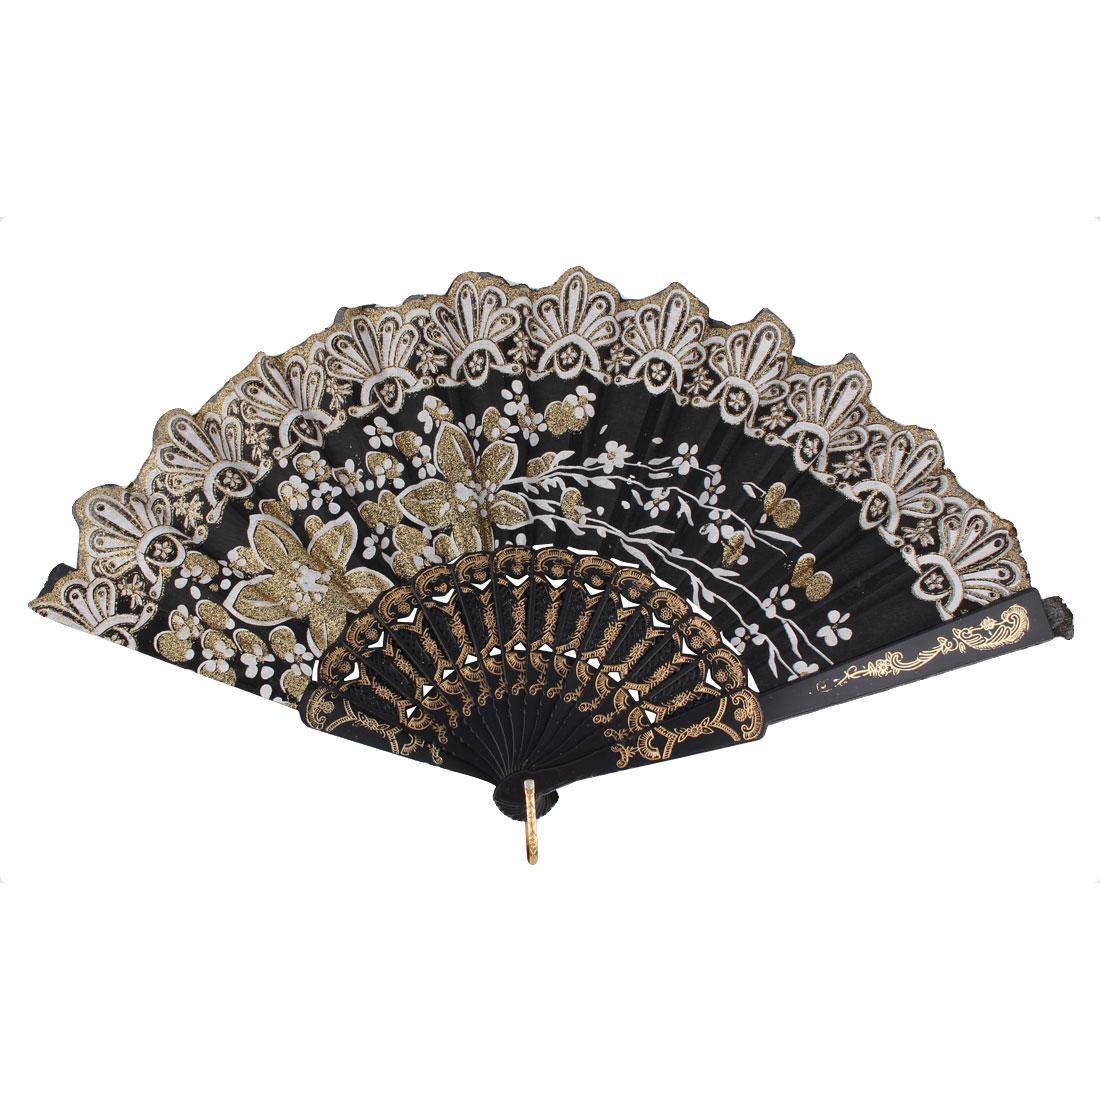 Dancing Wedding Chinese Style Flower Pattern Folding Hand Fan Gold Tone Black